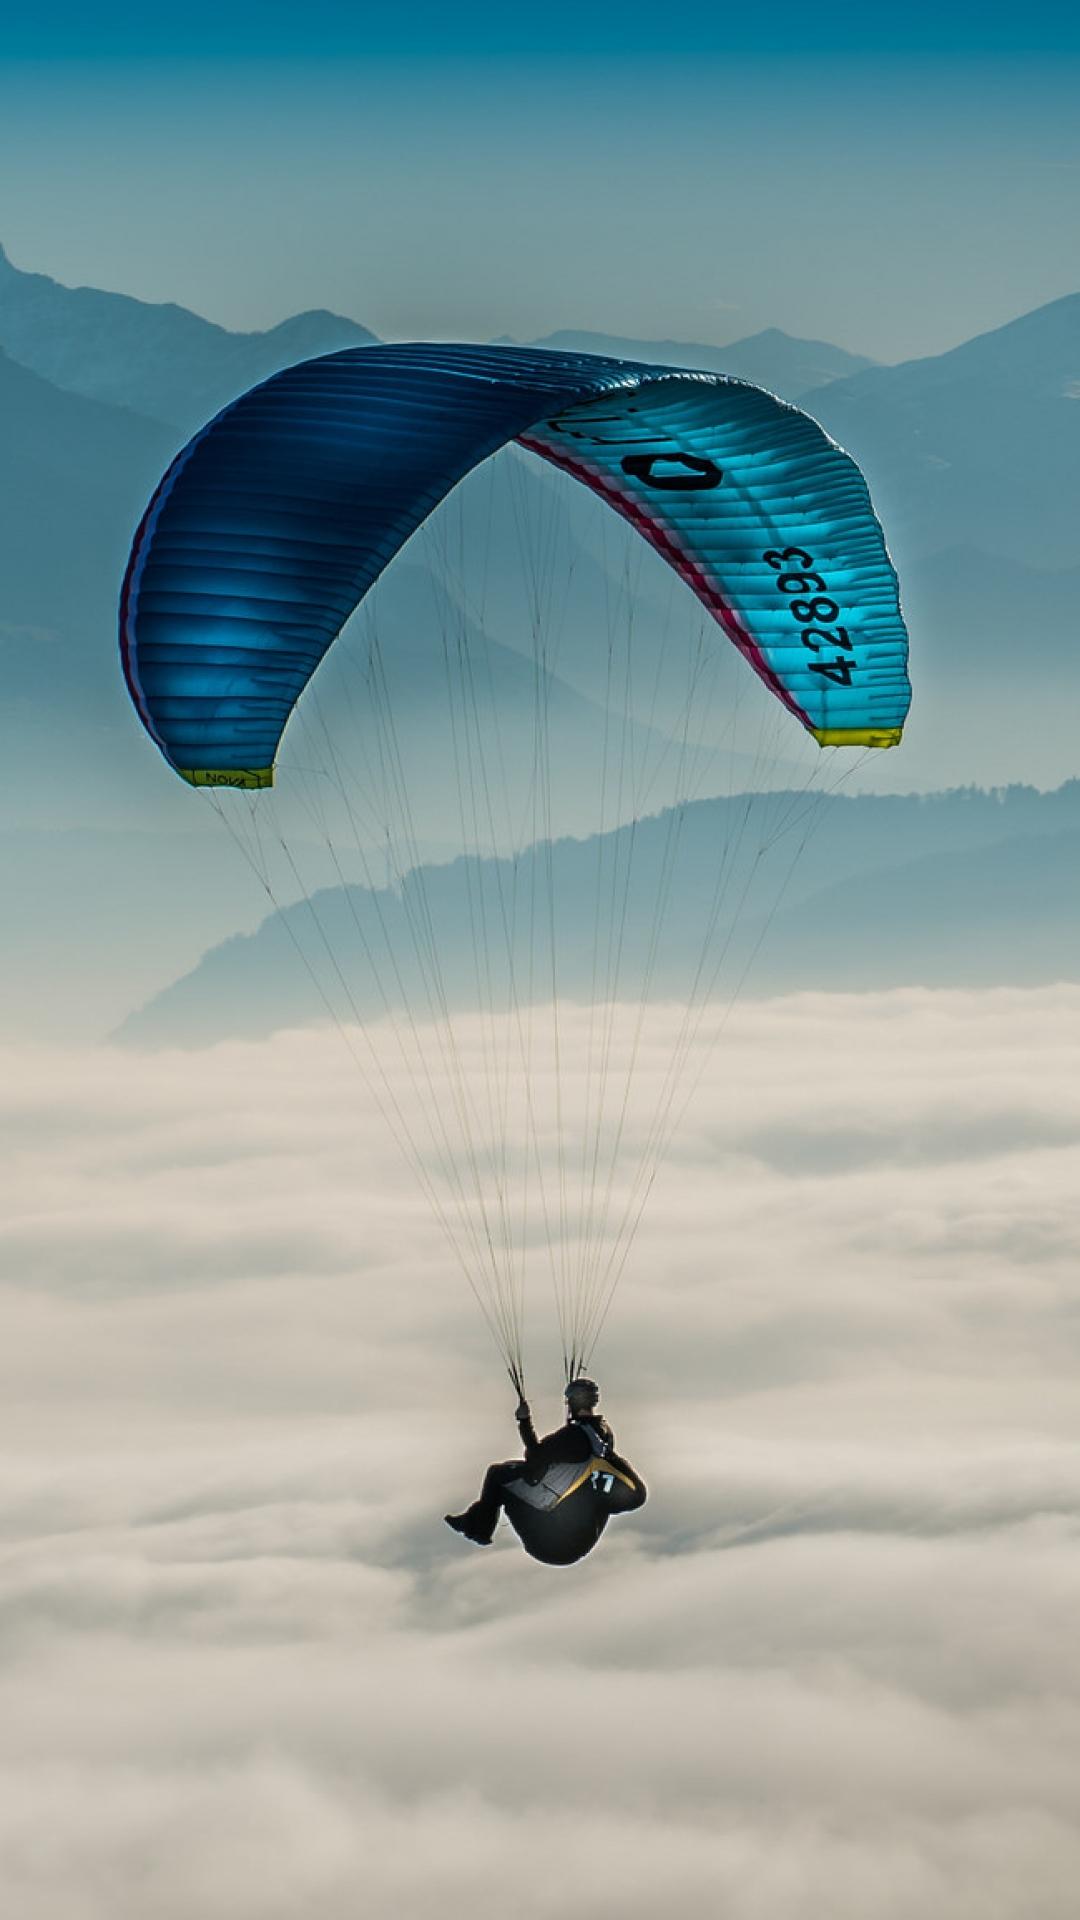 paragliding sky clouds 108156 1080x1920 Paragliding